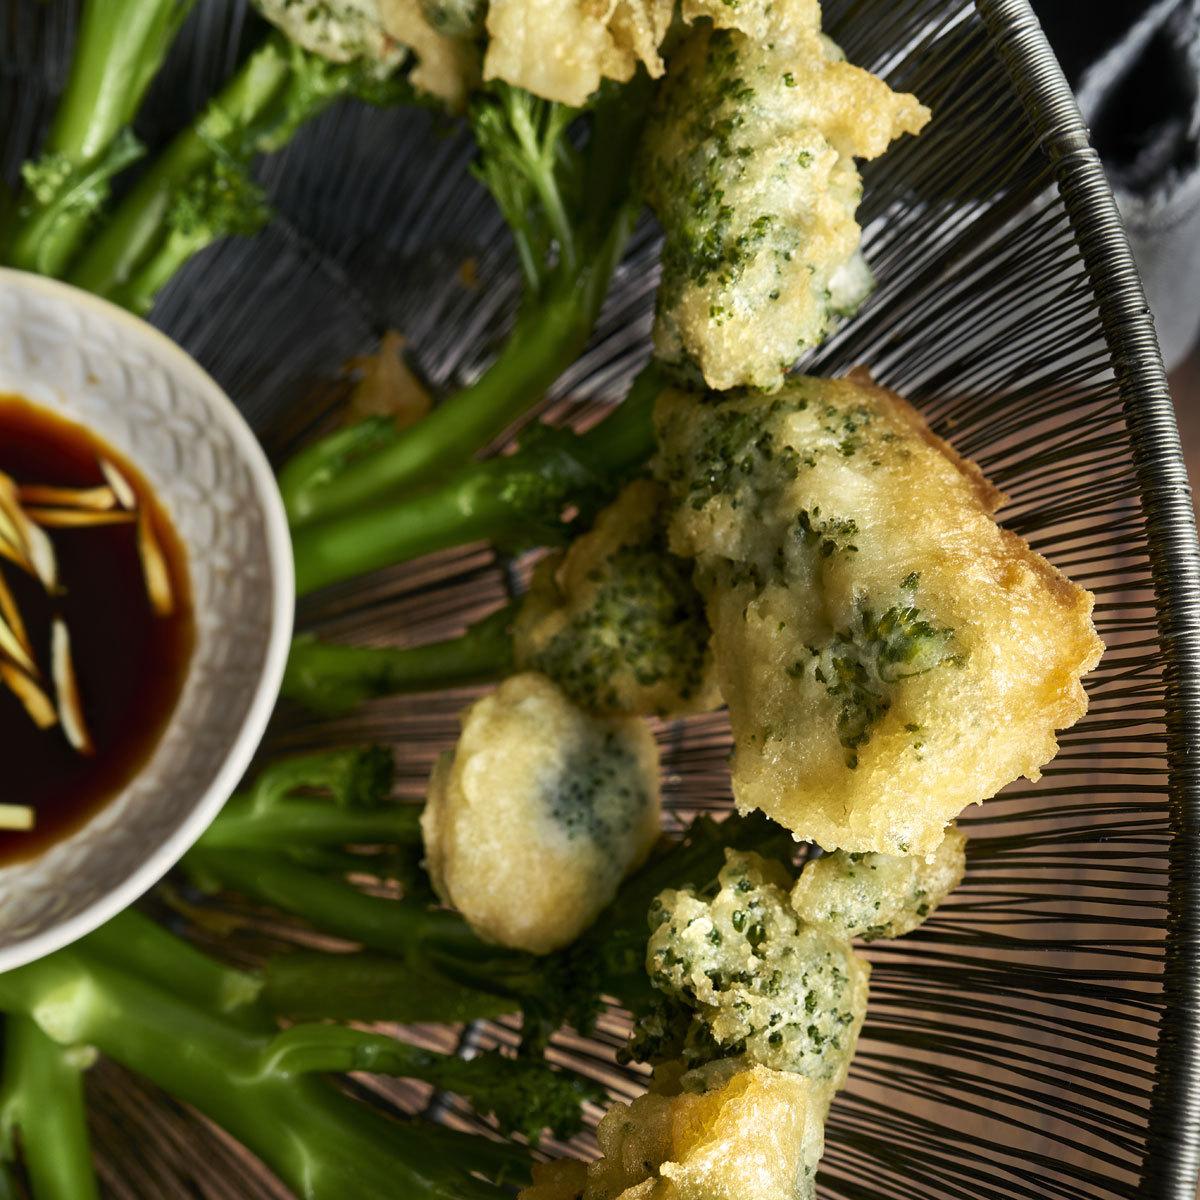 Bimi en tempura con salsa teriyaki.